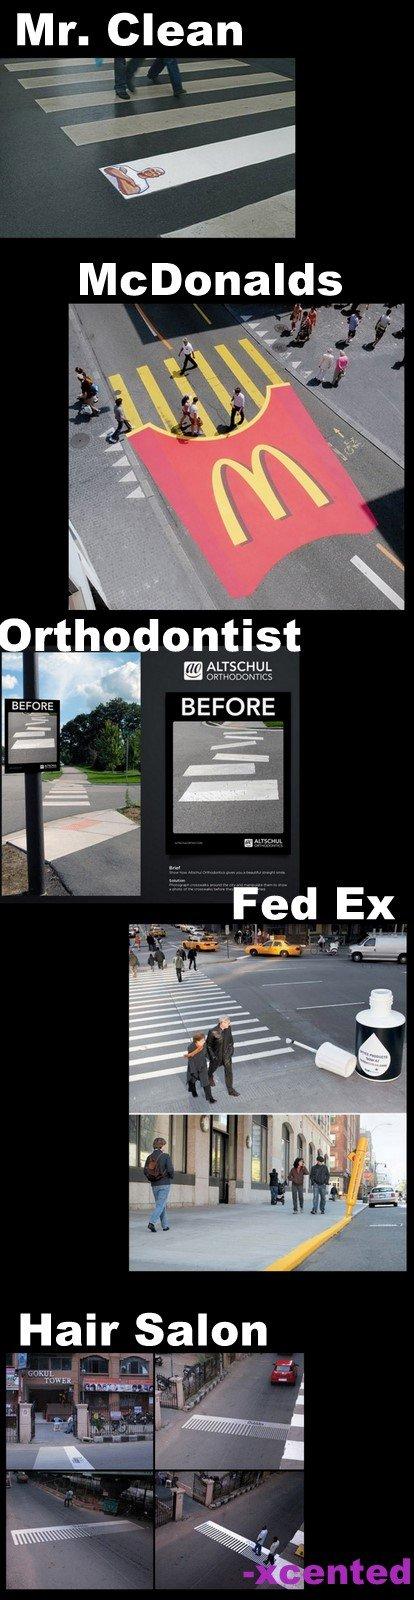 Crosswalk Ads. some really cool crosswalk ads that i found...hope you like it!<br /> if i get +15 thumbs il post more cool stuff. ALTSA HUL BFORE cool crosswalk a